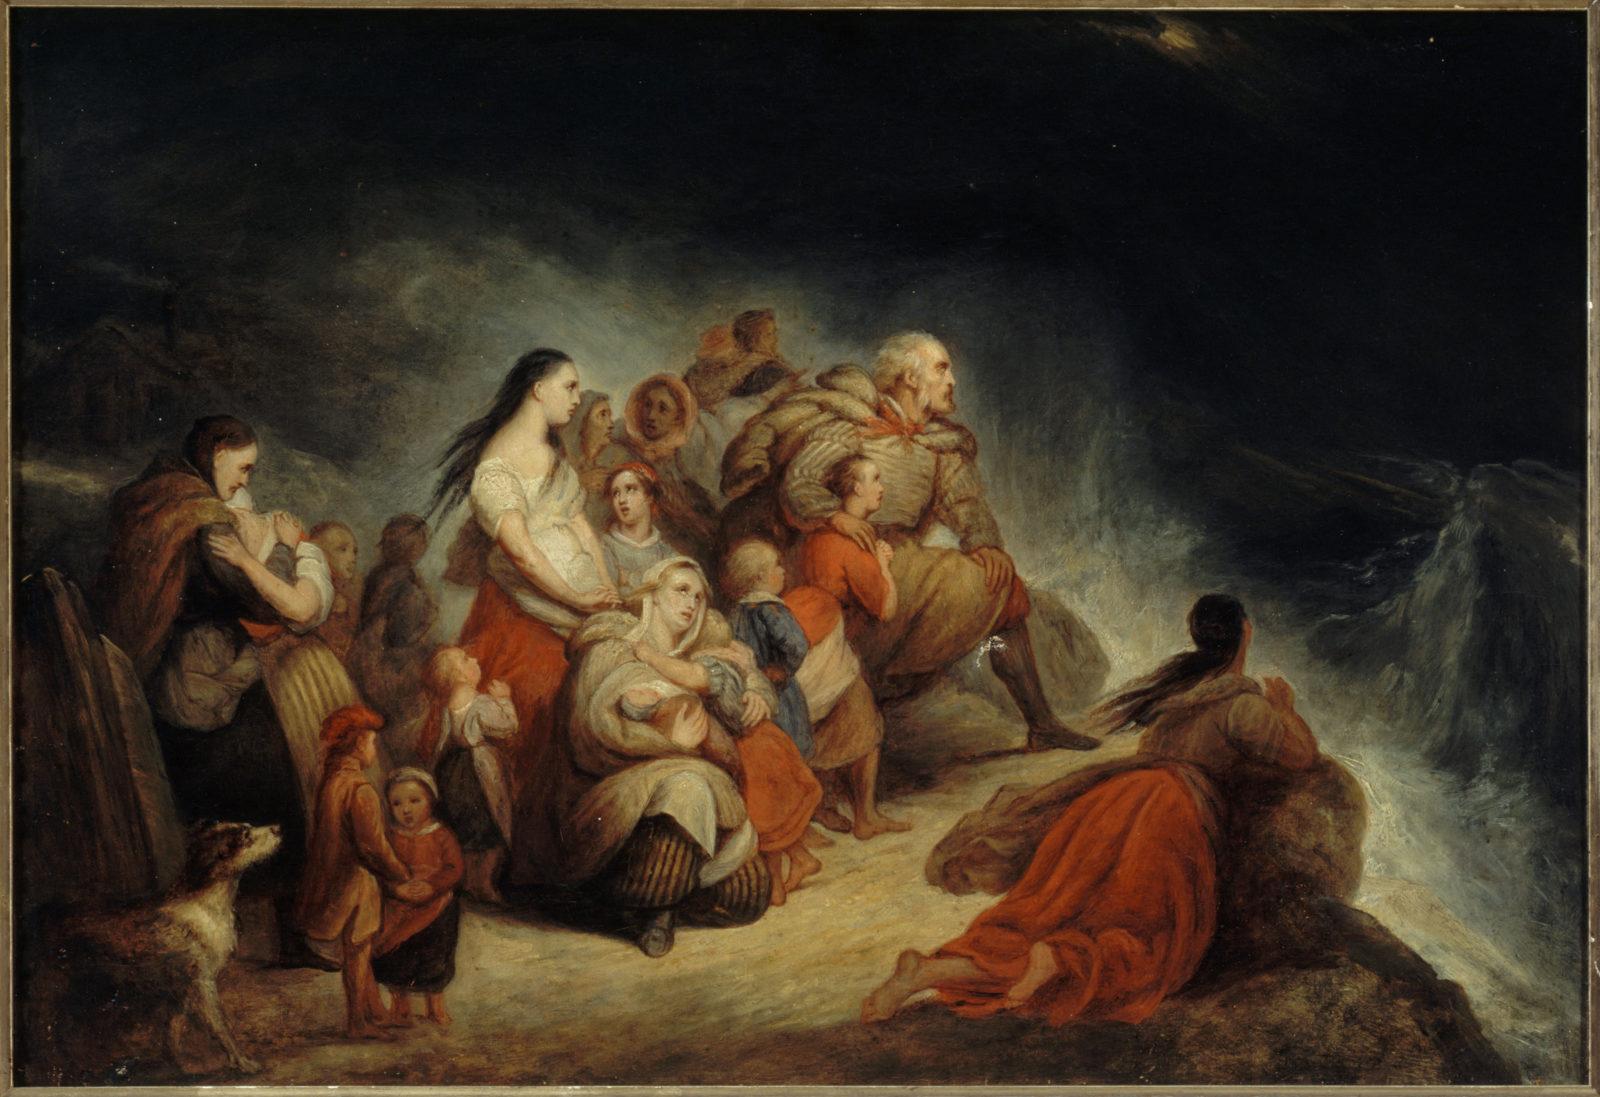 Ary Scheffer, (1795-1858), La Tempête,